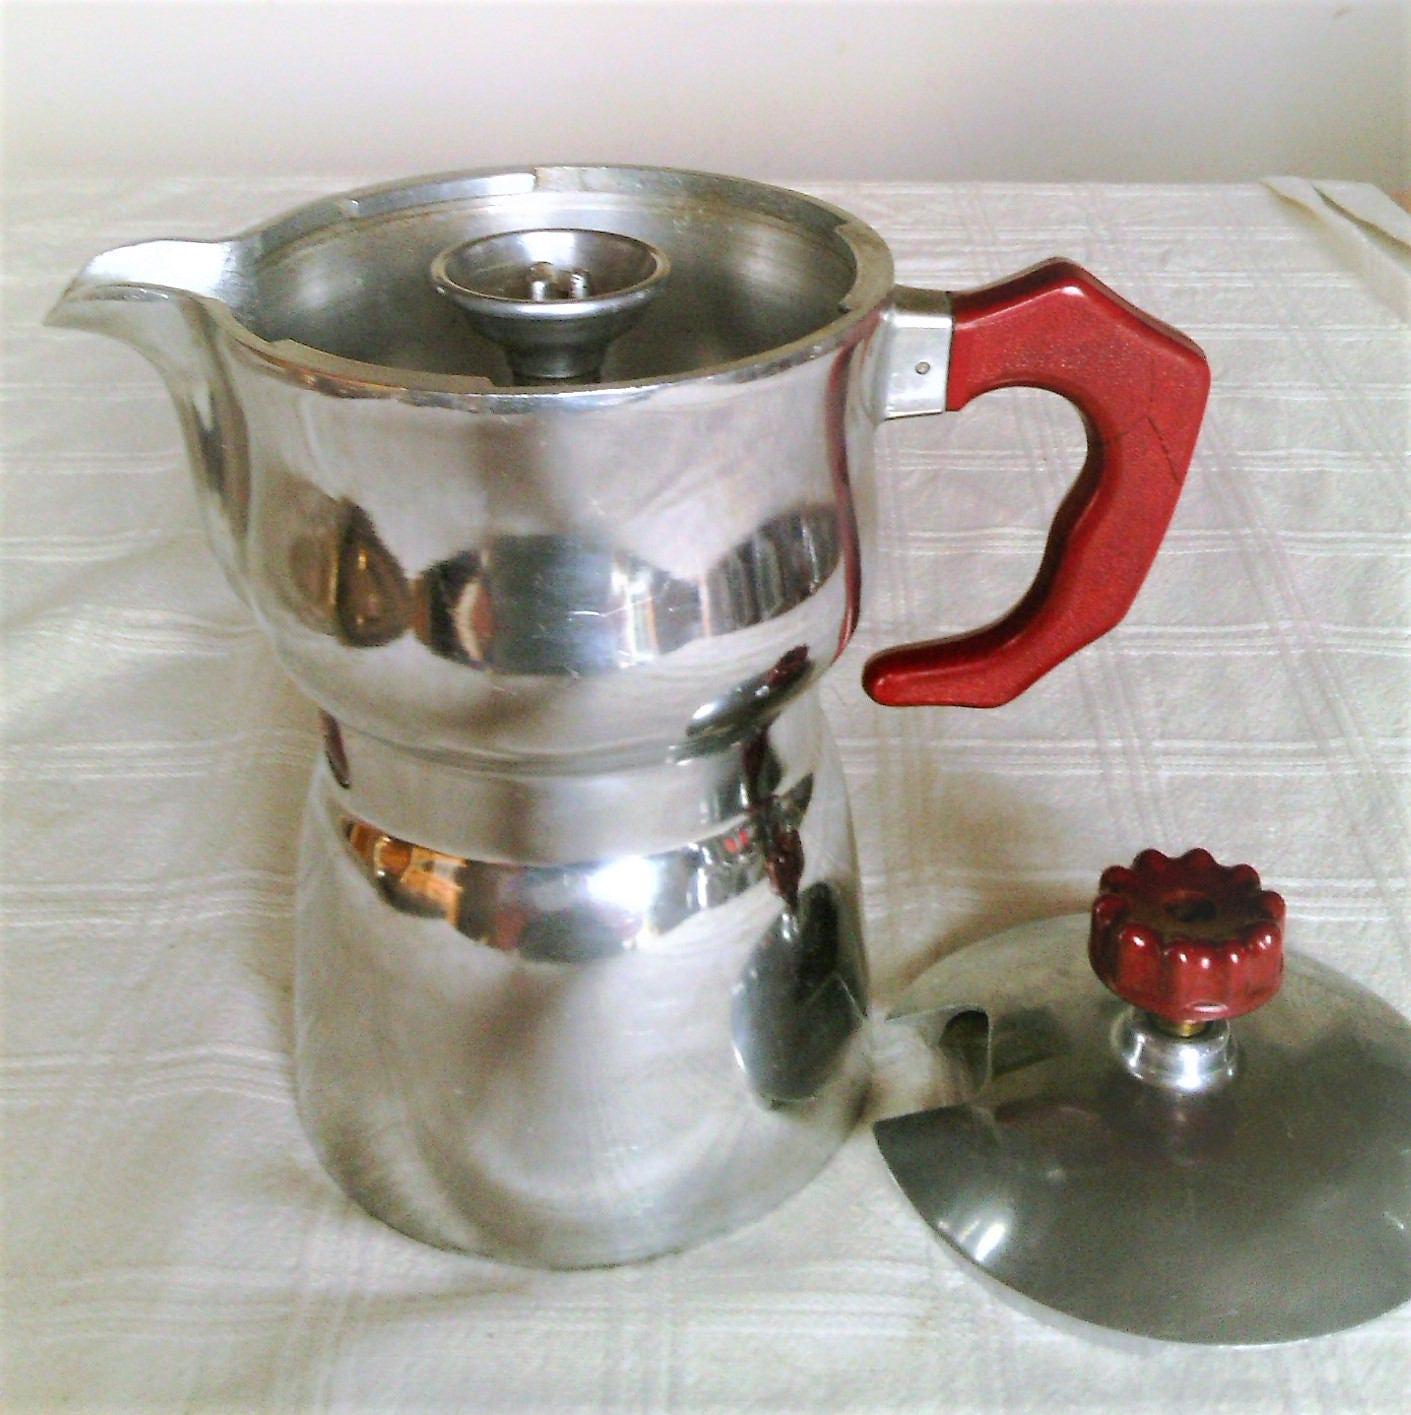 Caffexpress Vintage Italian Drip Coffee Maker or Coffee Pot